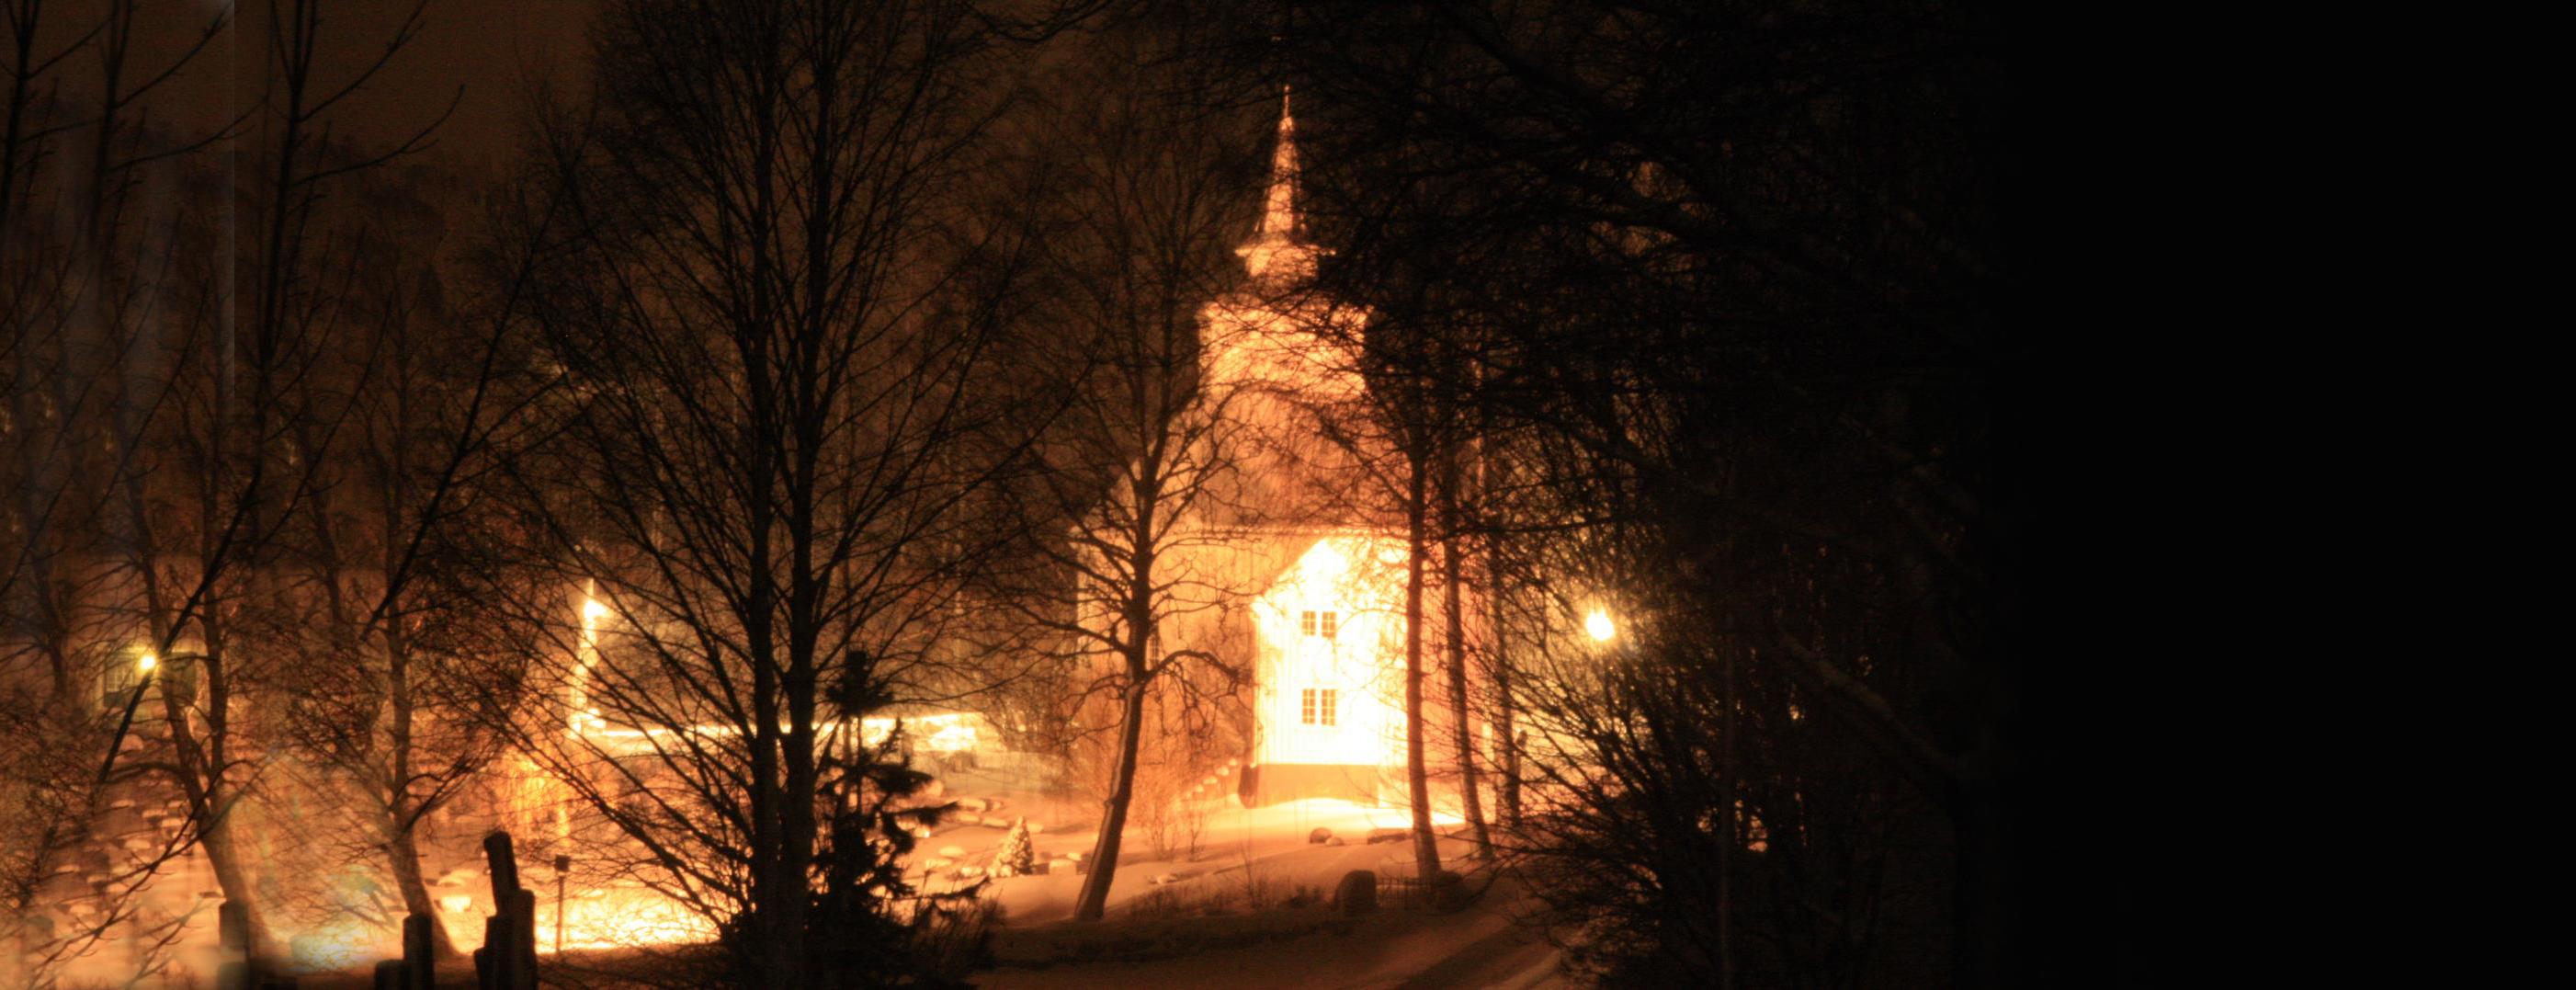 Mykland kirke